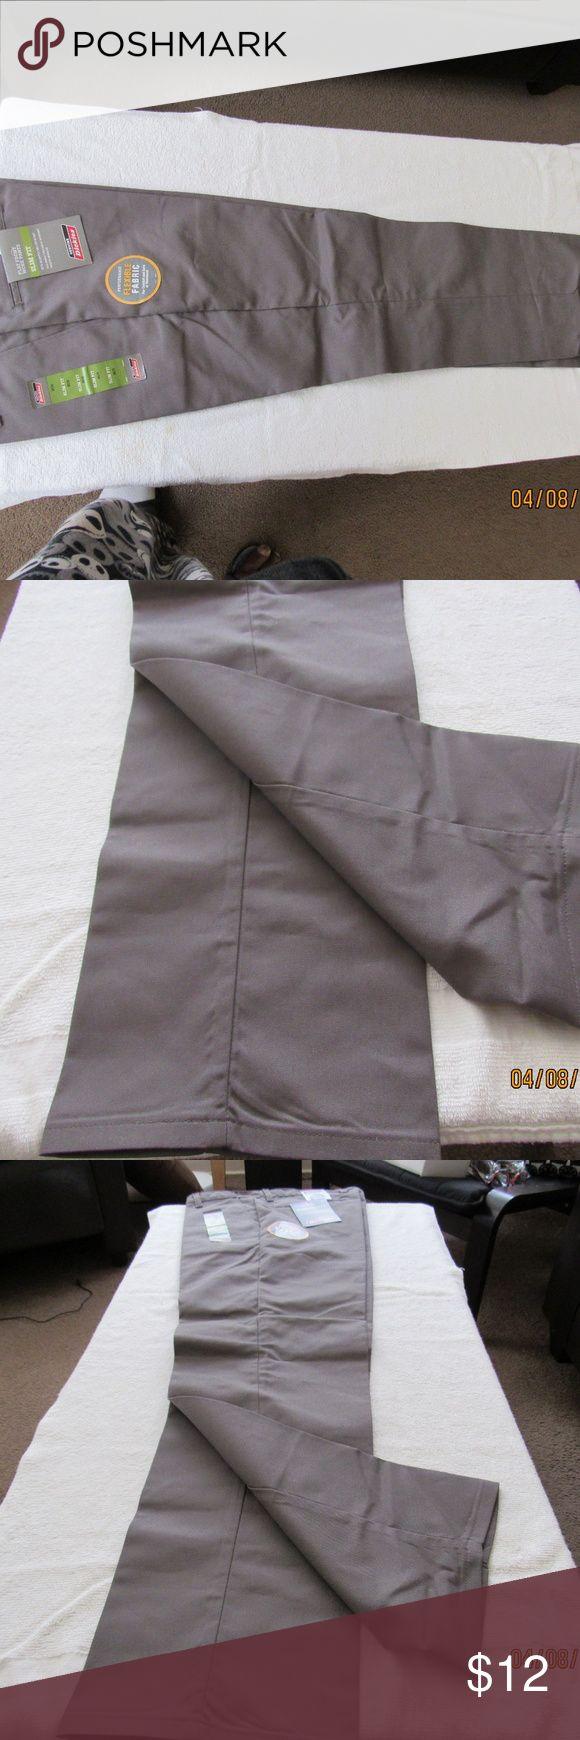 Men's Dickie work pants Gray Khaki Dickie Pants Dickies Pants Chinos & Khakis